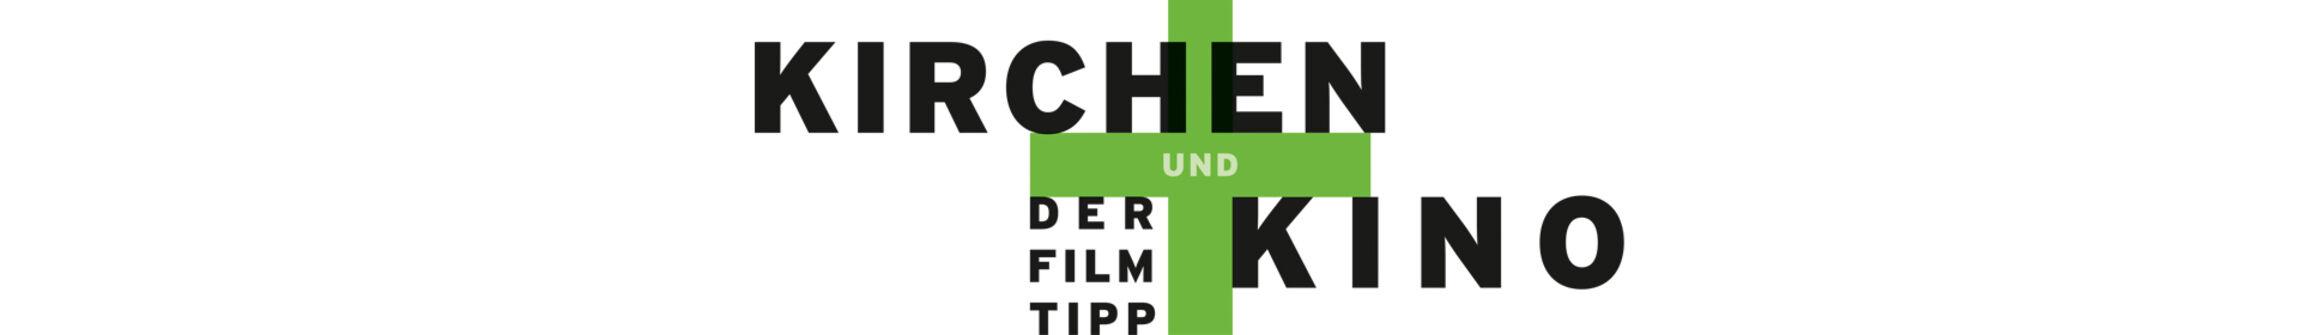 kopfgrafik-logo 2018